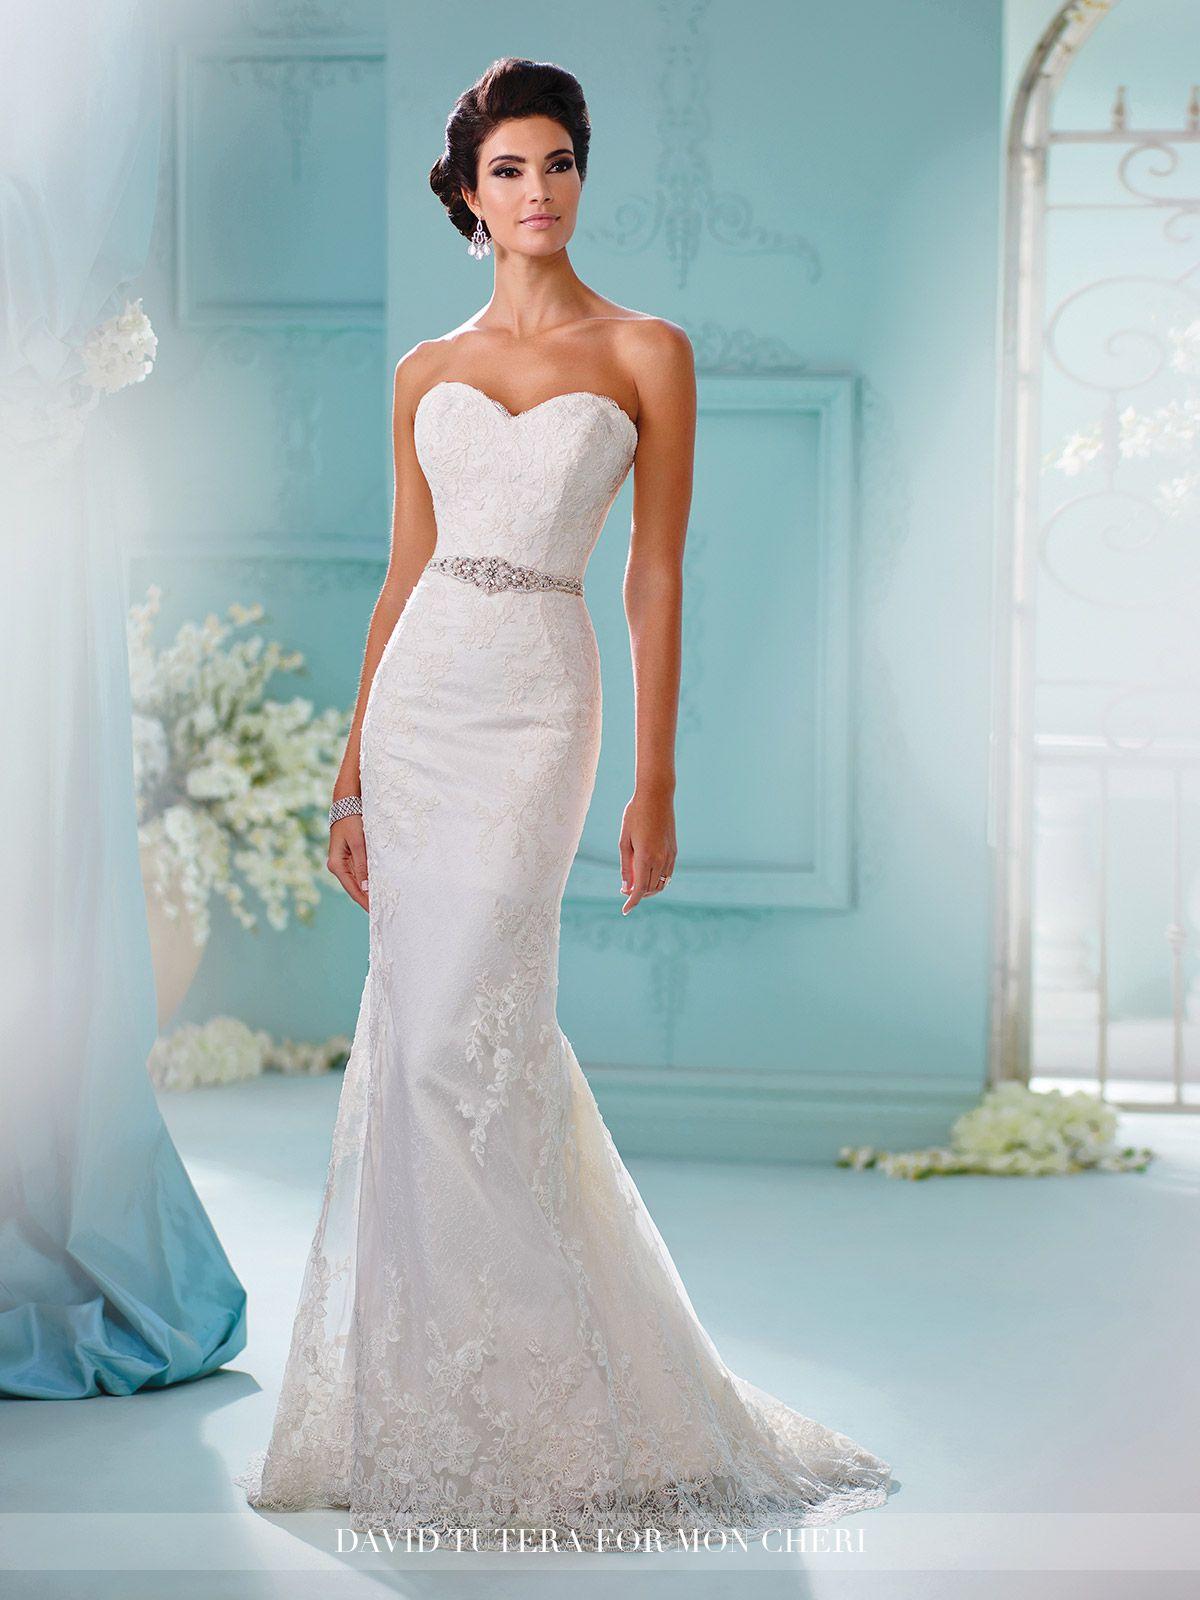 David Tutera Wedding Dresses - 216259 Skylar | Dress set, Lace and ...